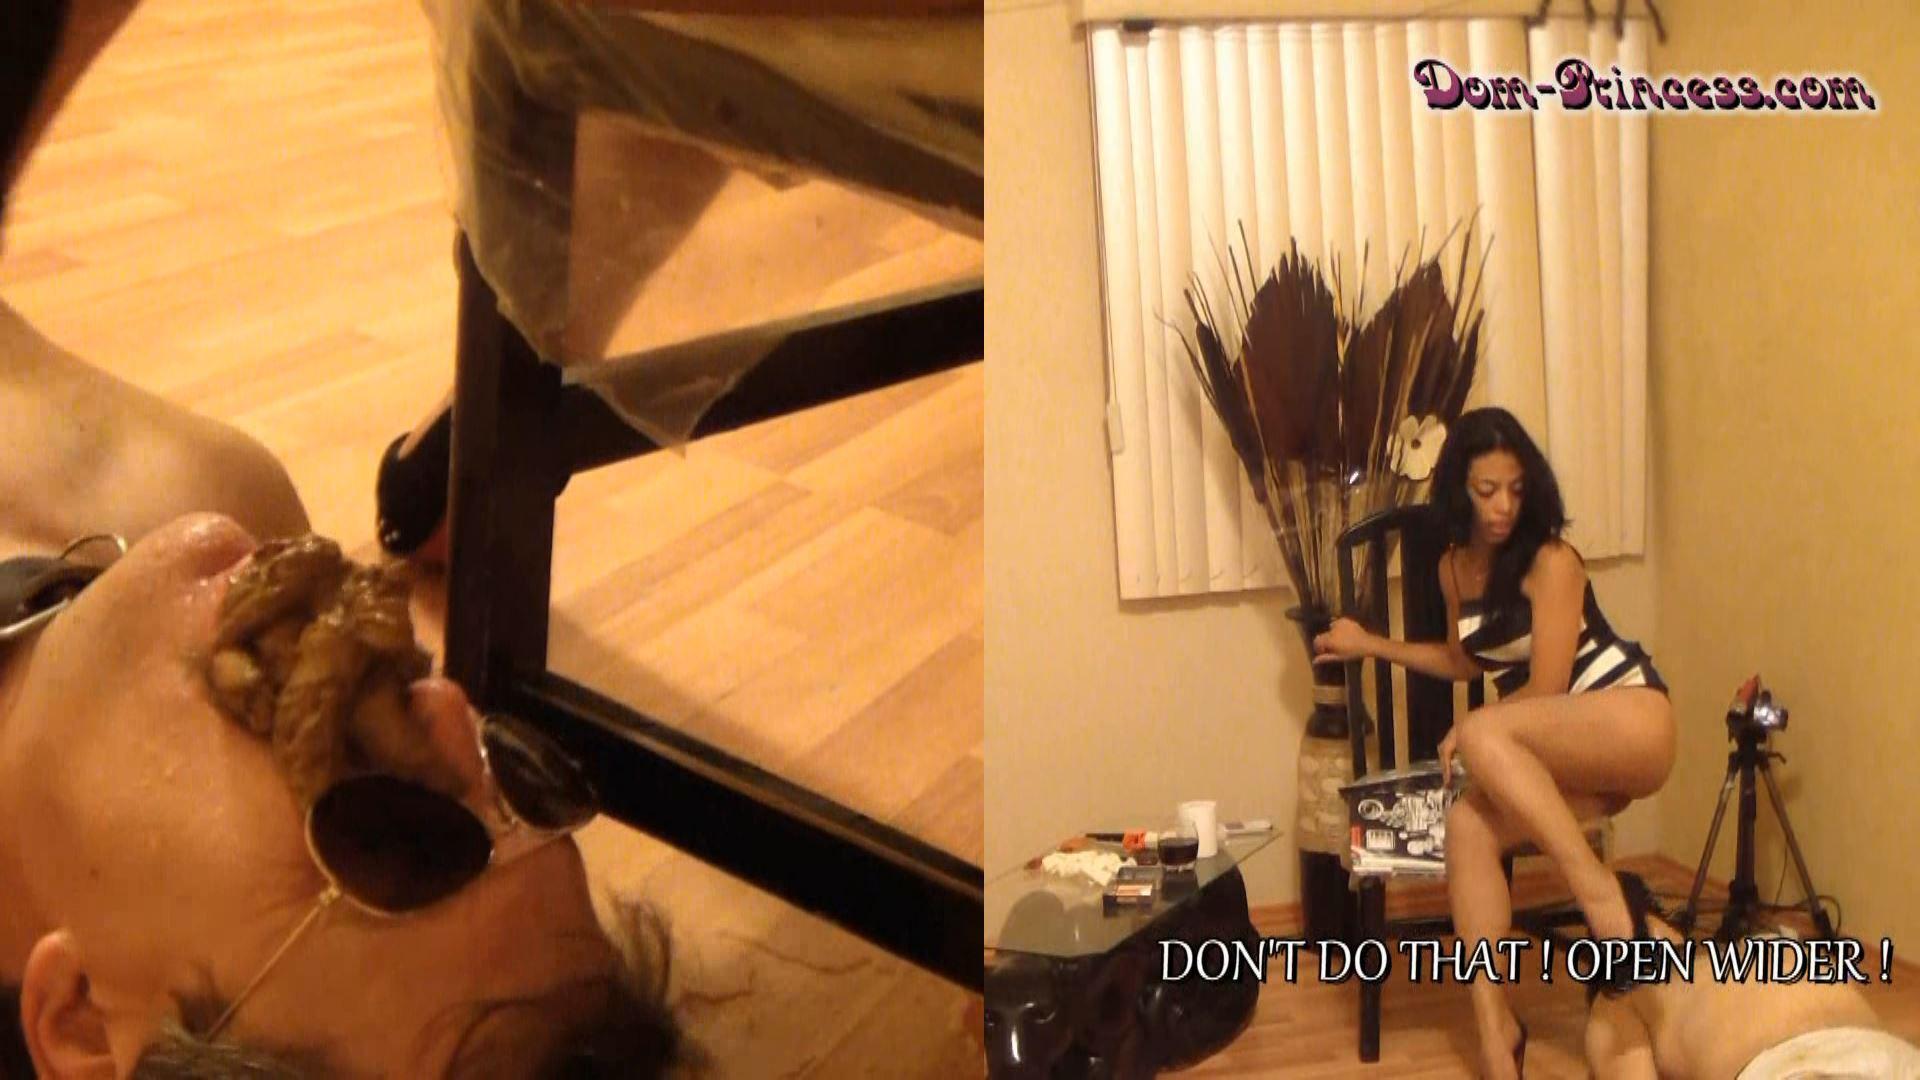 Talking Toilets, I have her my Way Part 4 Diana - DOM-PRINCESS - FULL HD/1080p/WMV